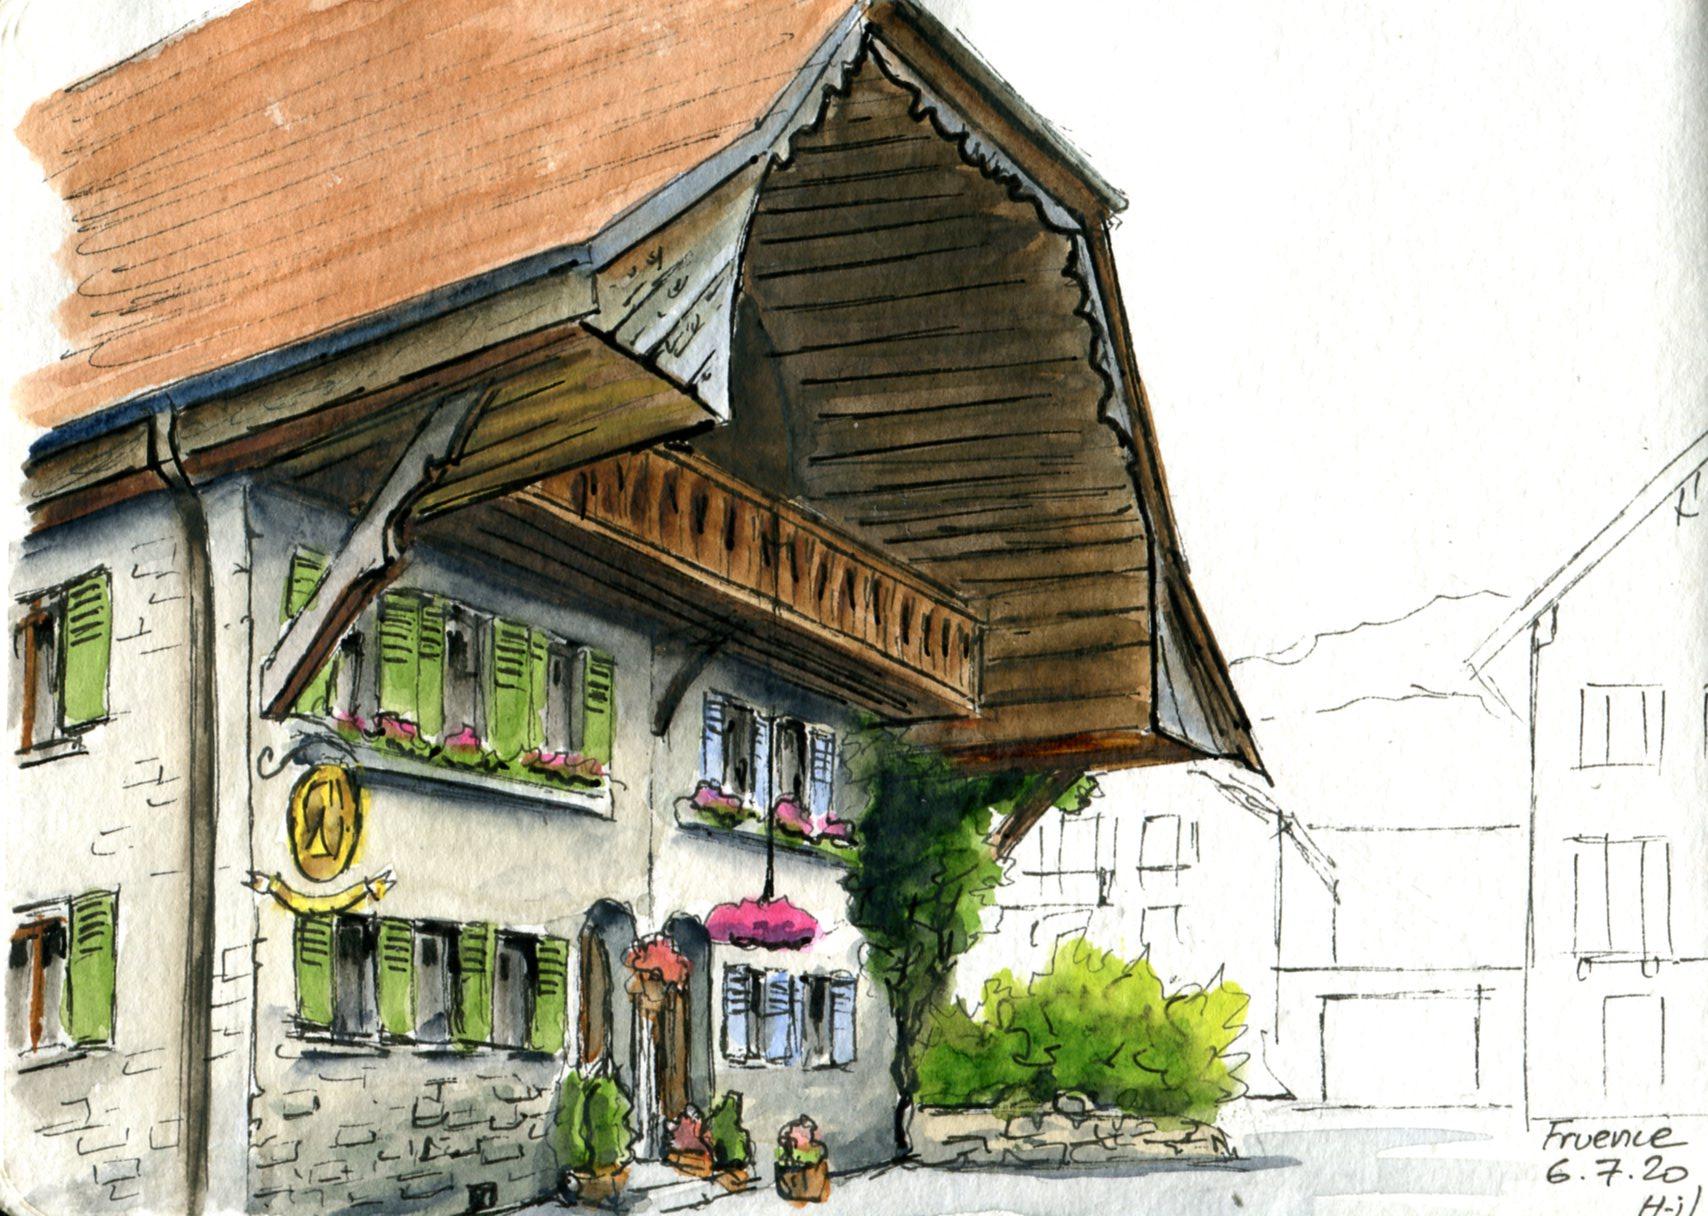 Maison Fruence057